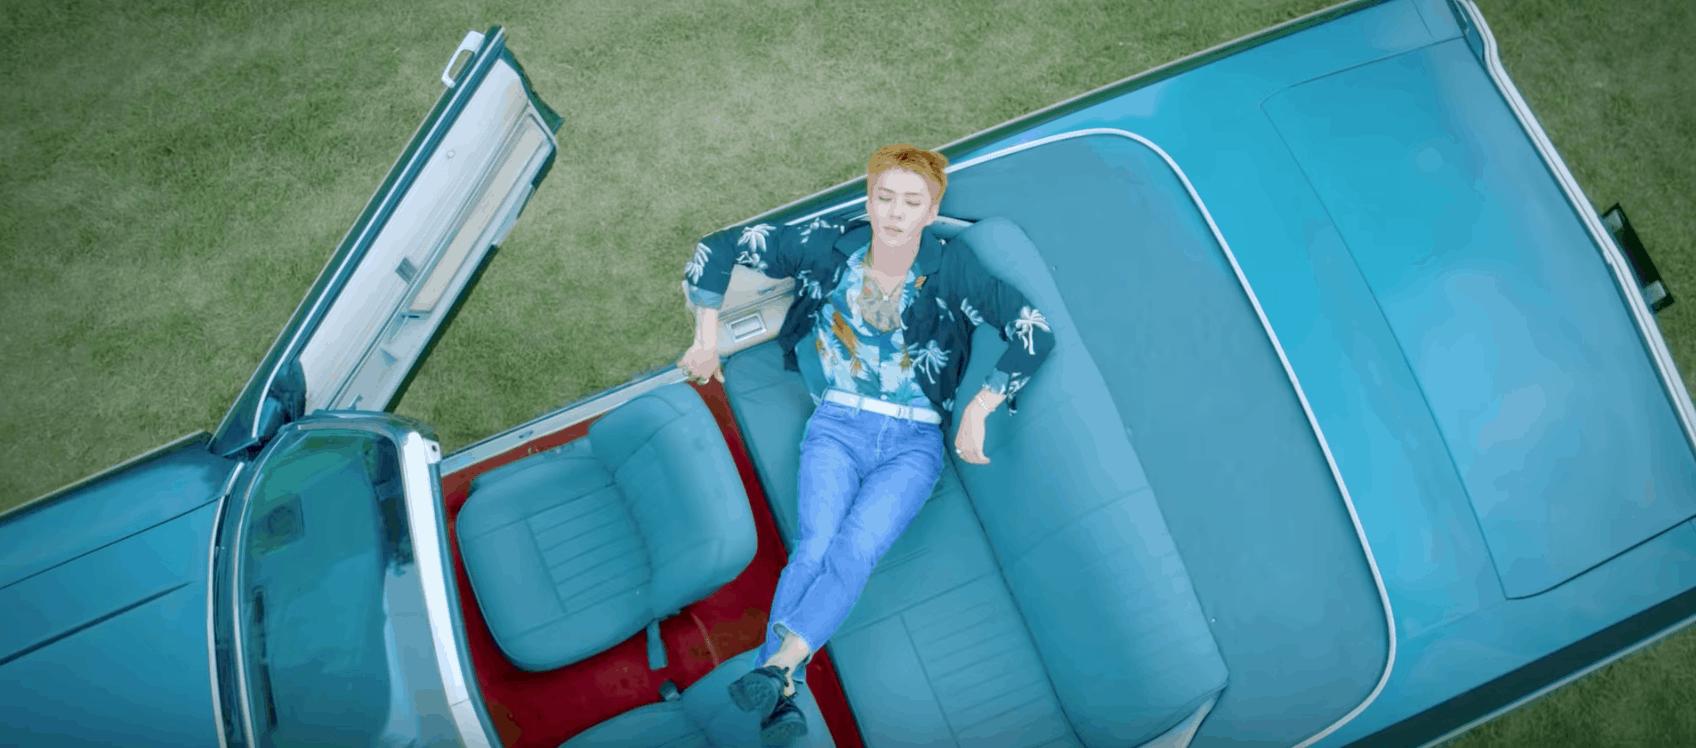 EXO Ko Ko Bop Video - Redheaded member sitting in a blue convertible car